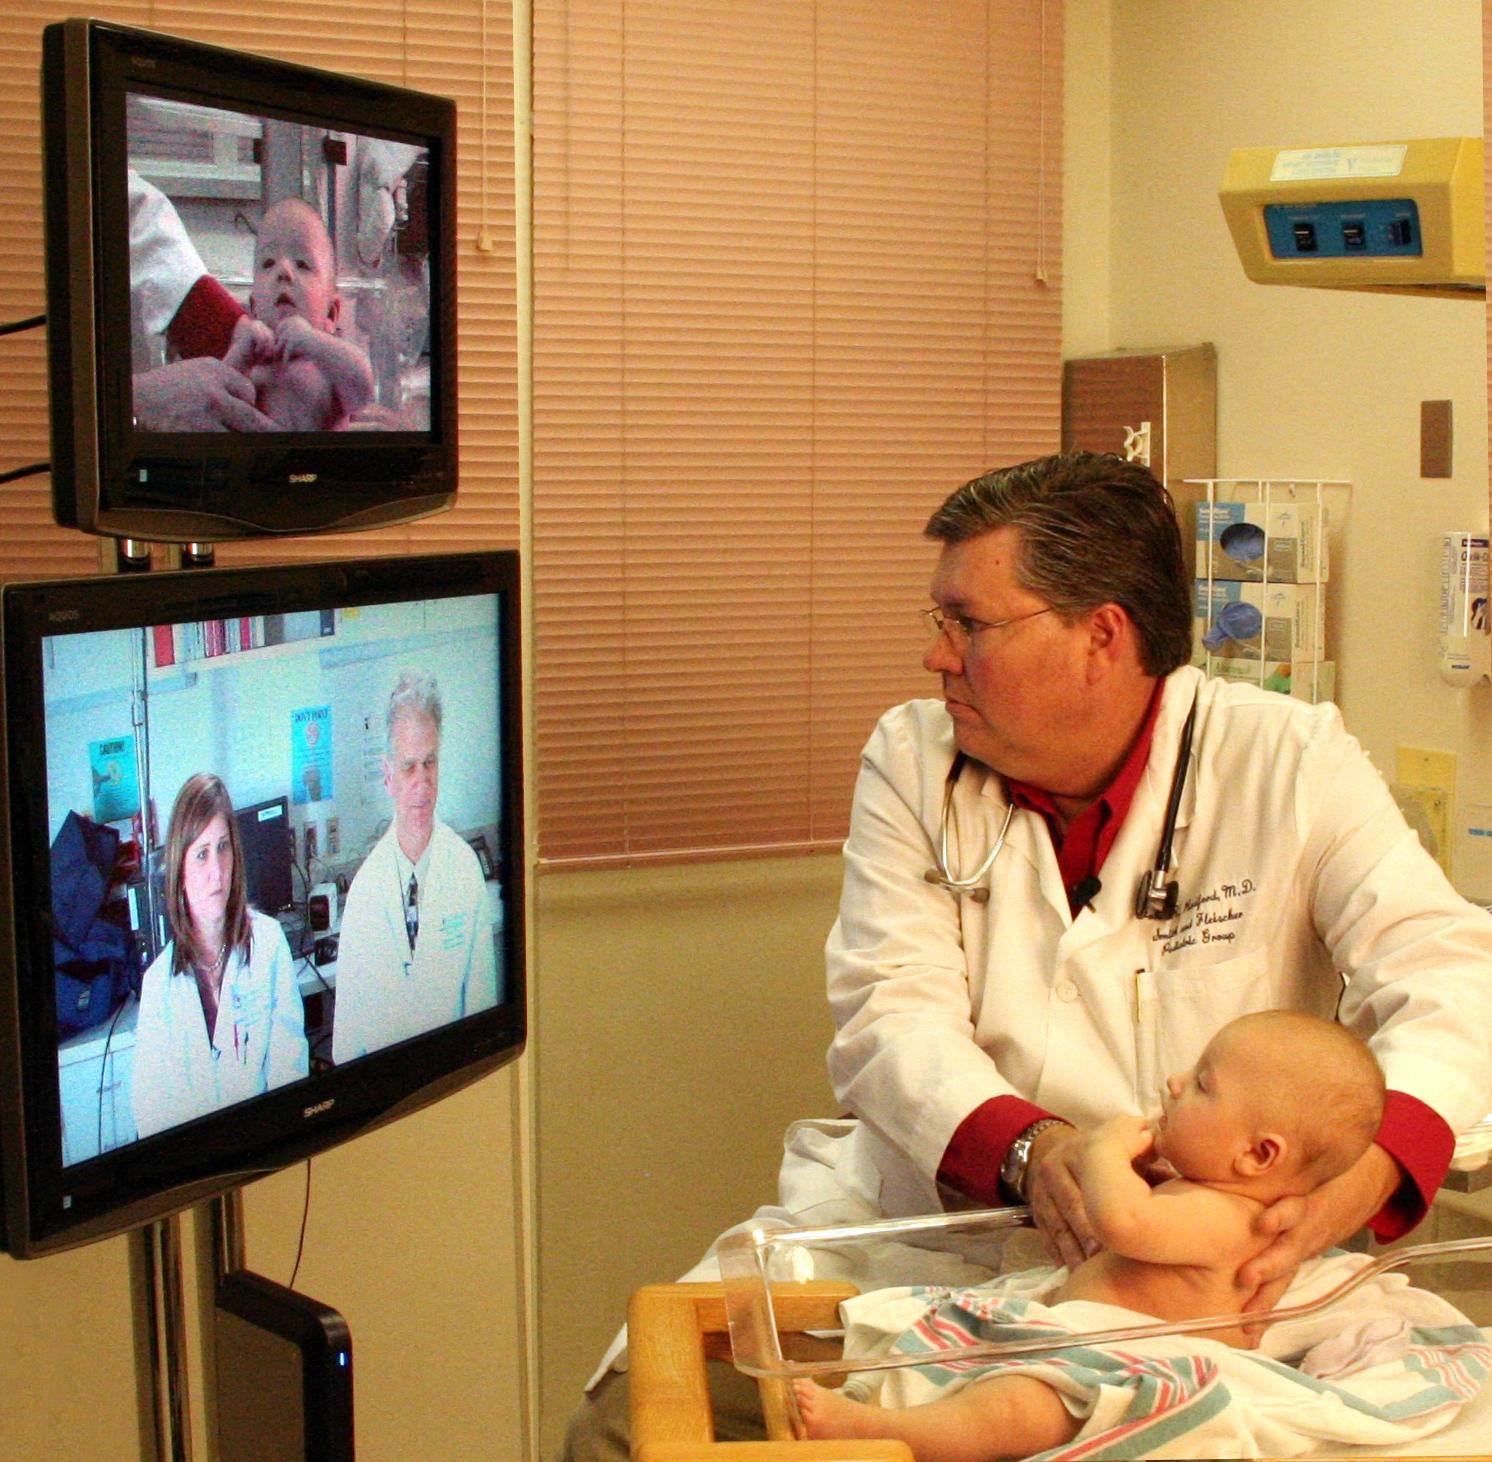 telemedicine news